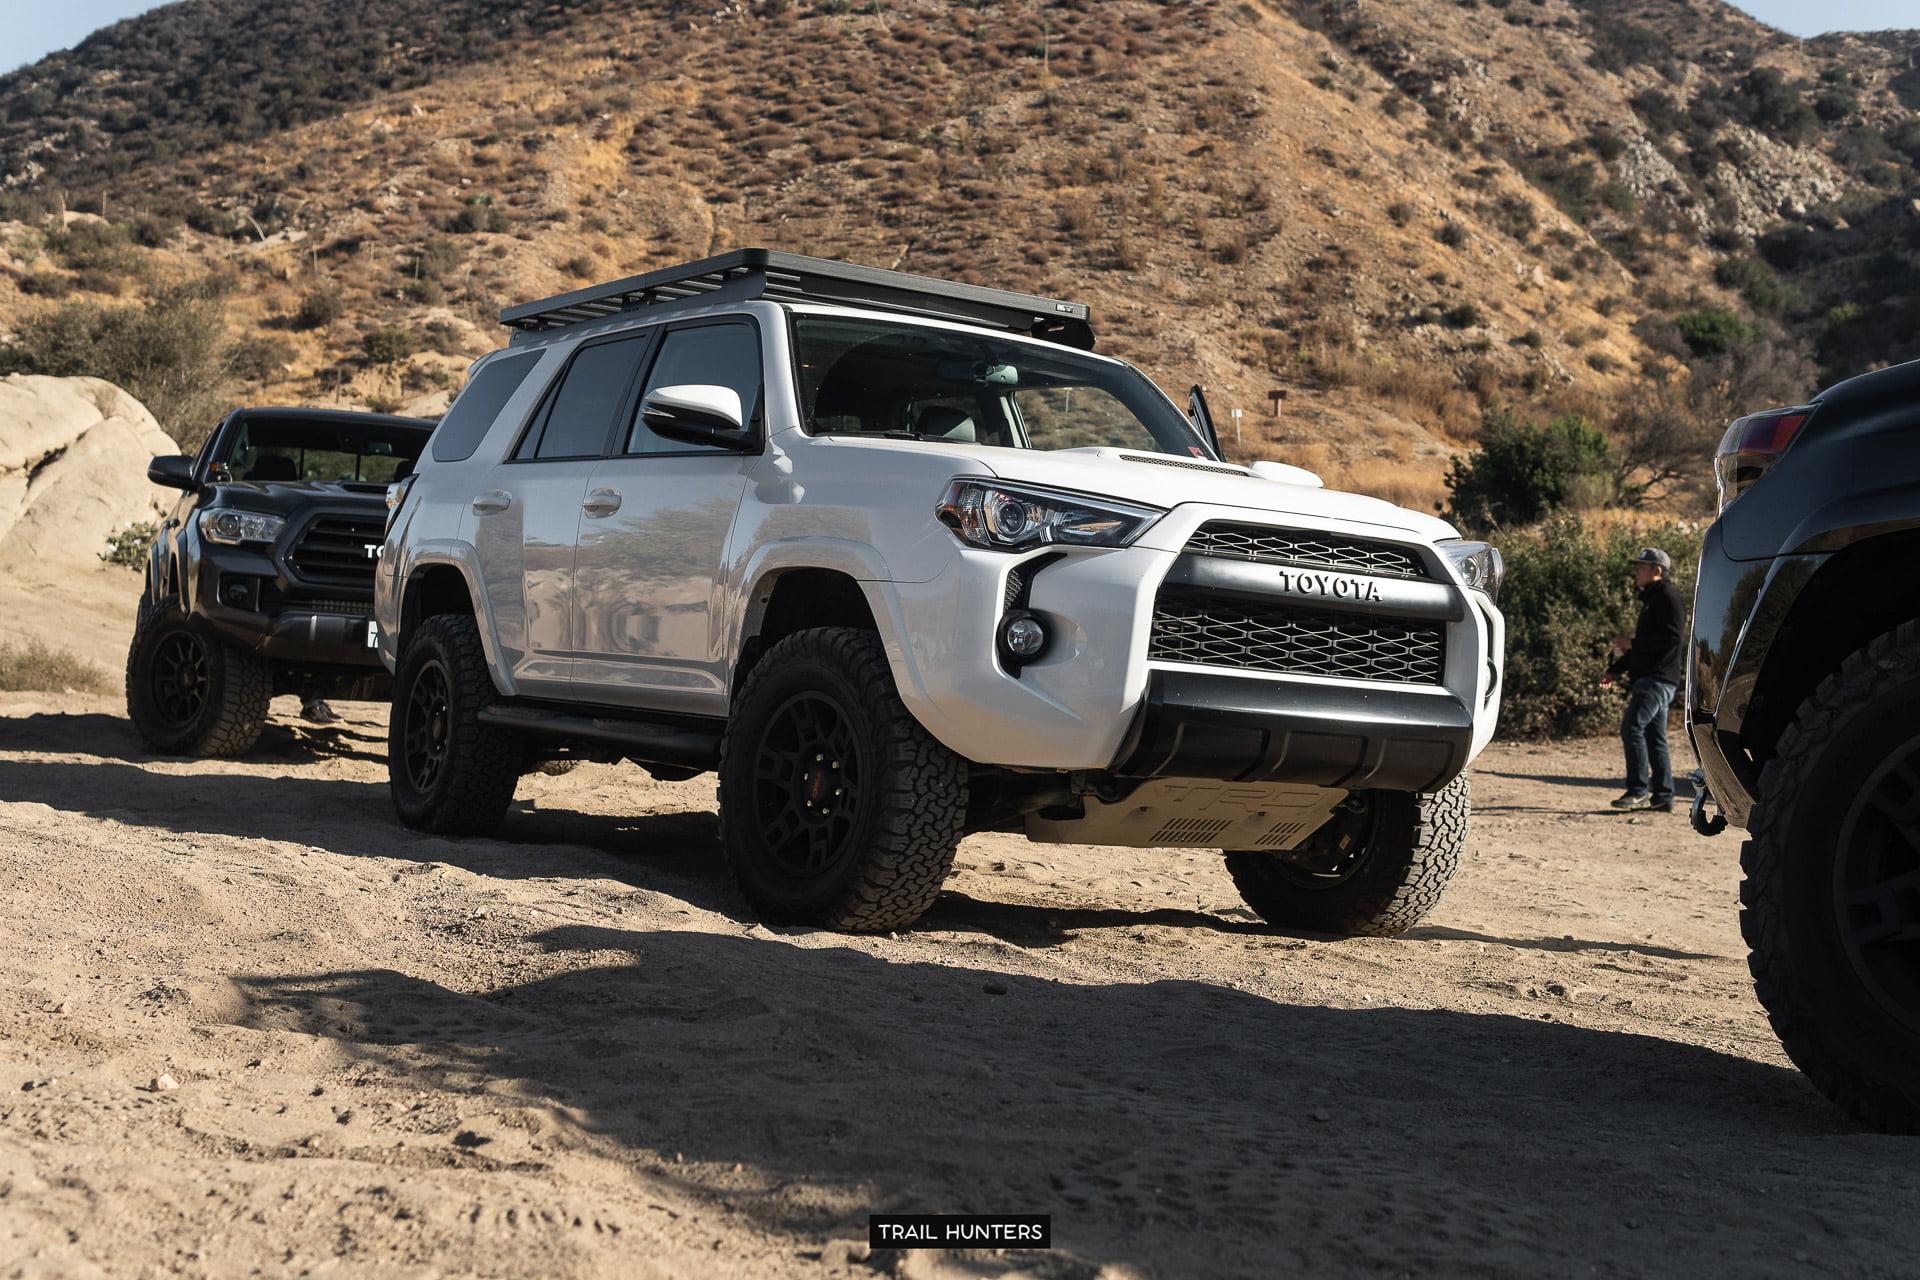 Toyota 4Runner @ Cleghorn OHV Trail